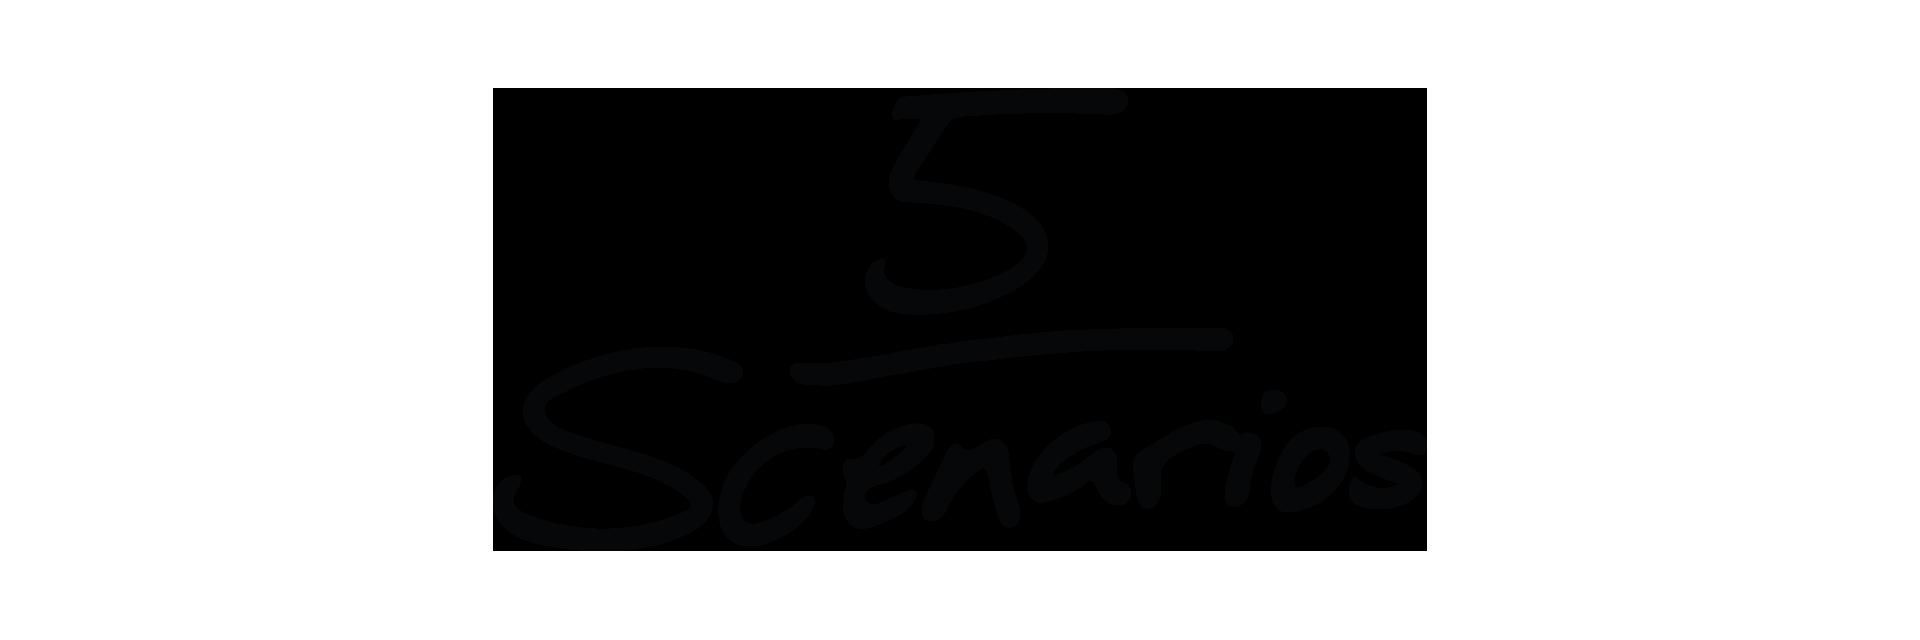 five-scenarios.png